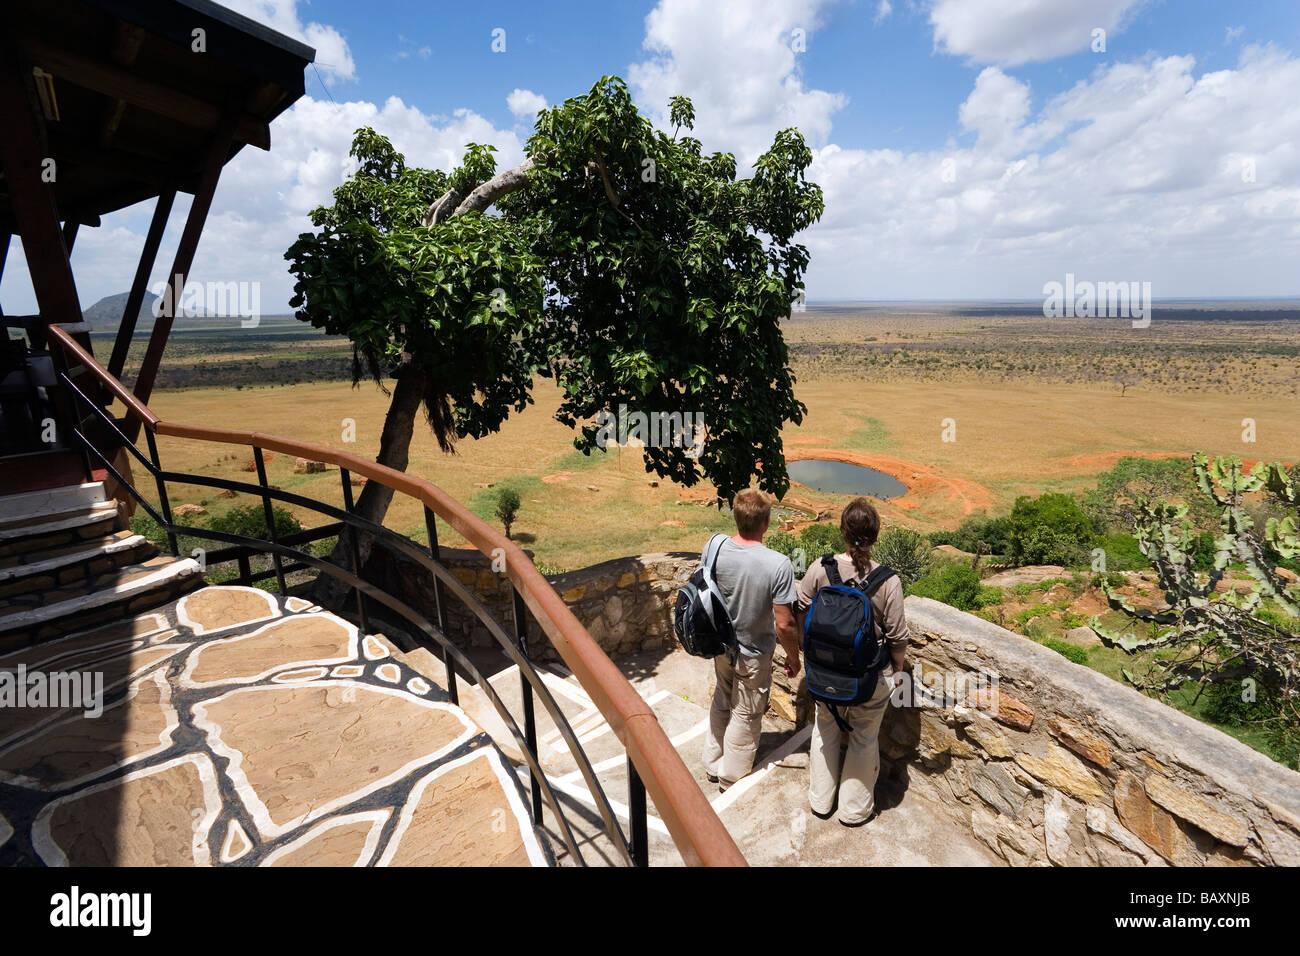 Guests looking over waterhole to savannah, Voi Safari Lodge, Tsavo East National Park, Coast, Kenya - Stock Image